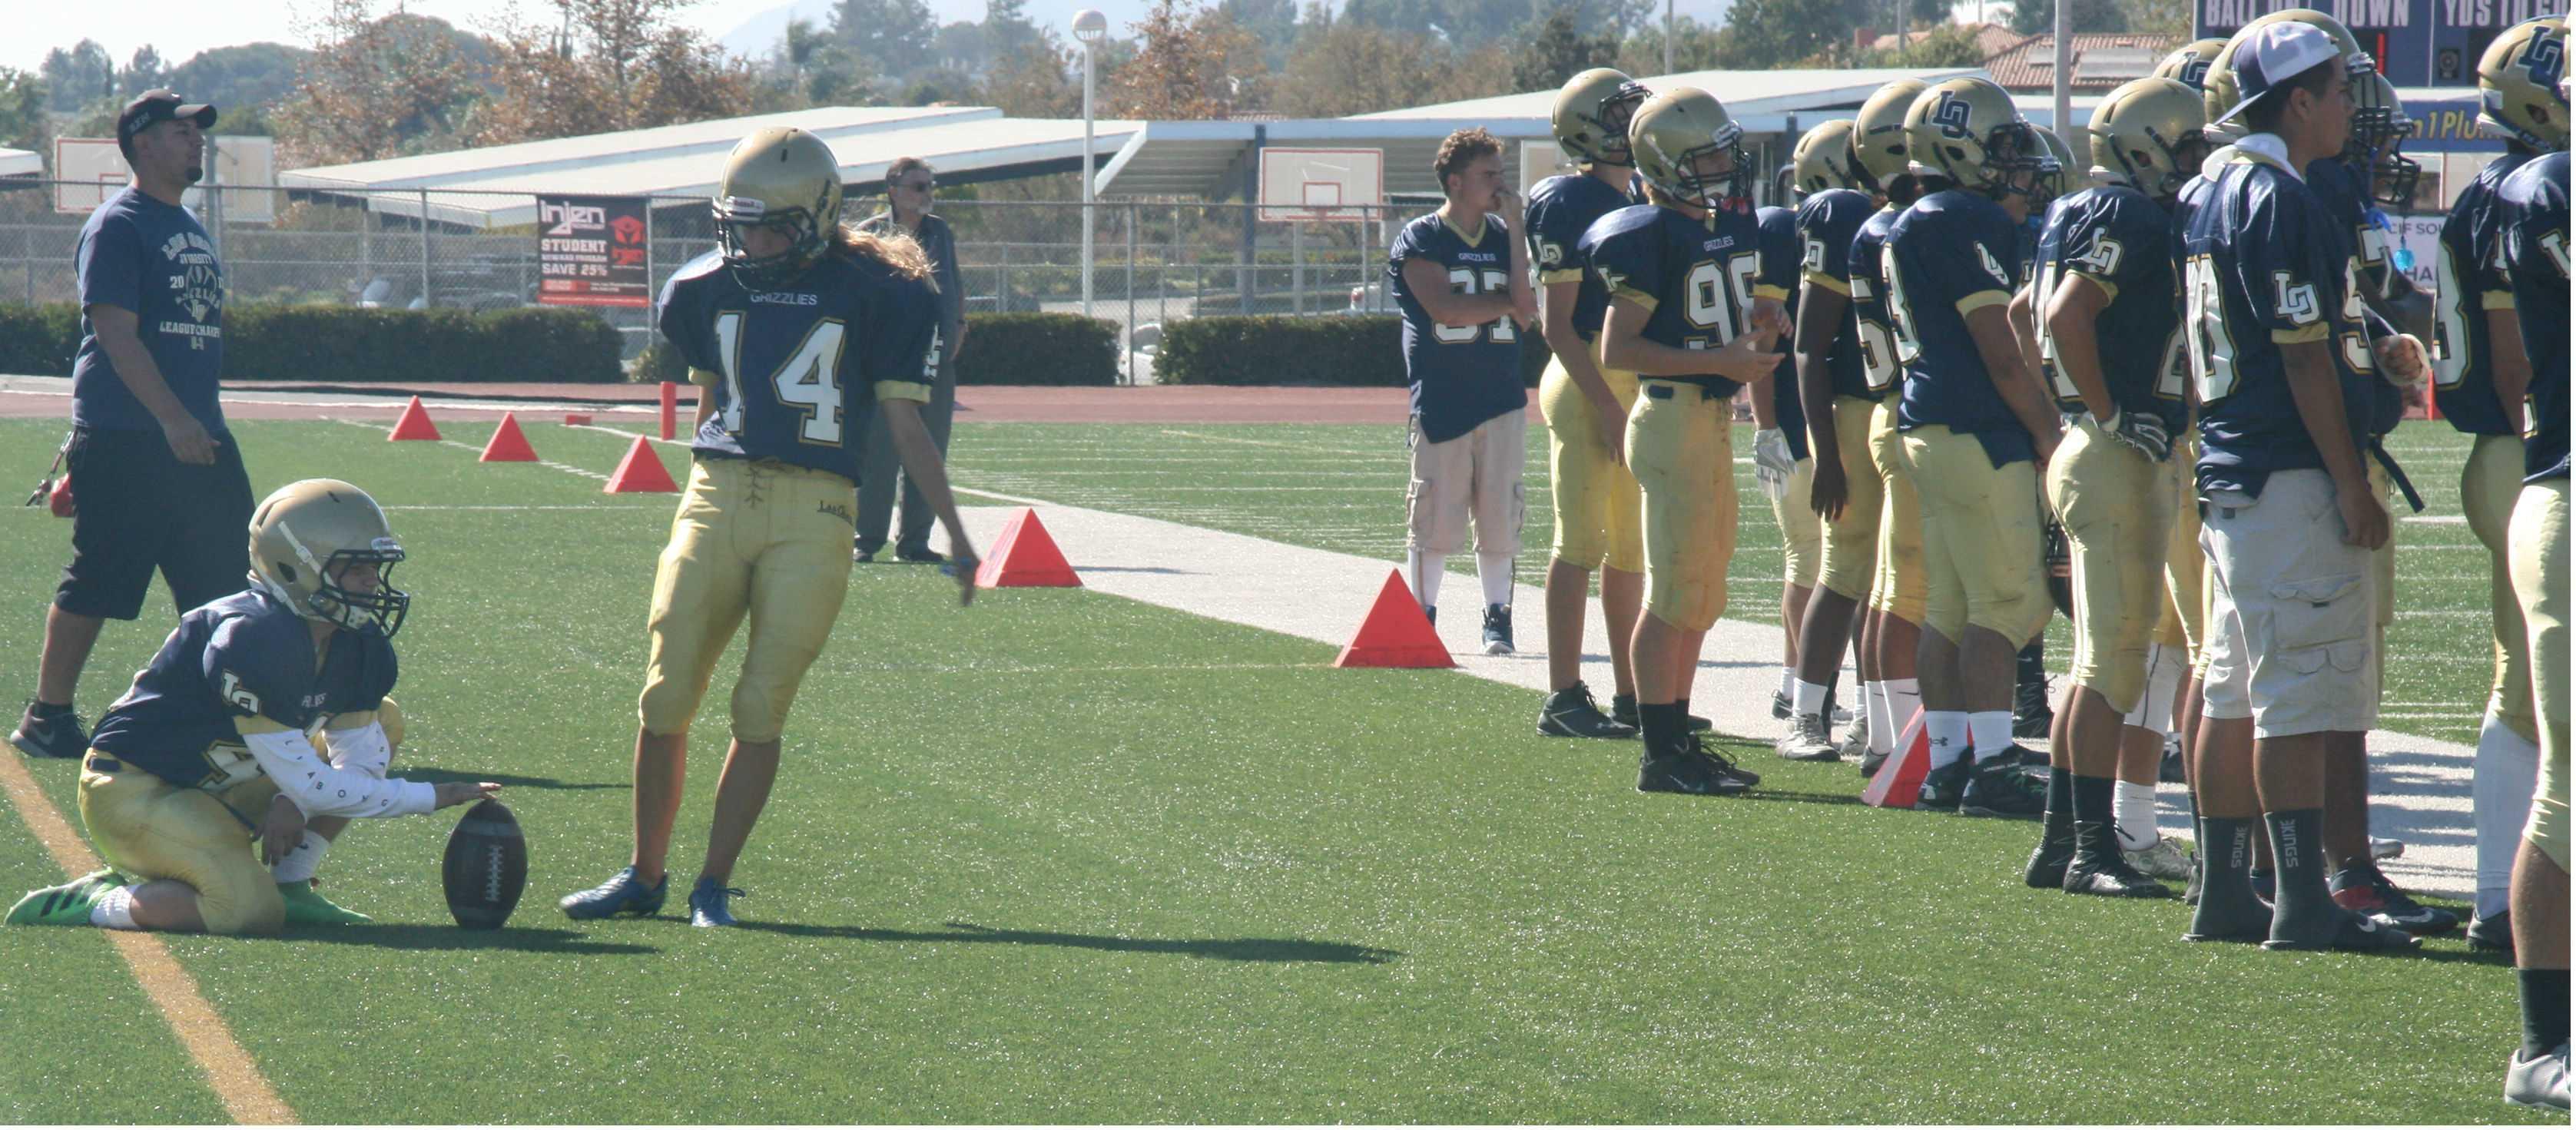 Hanna Moftman kicks a football during practice.